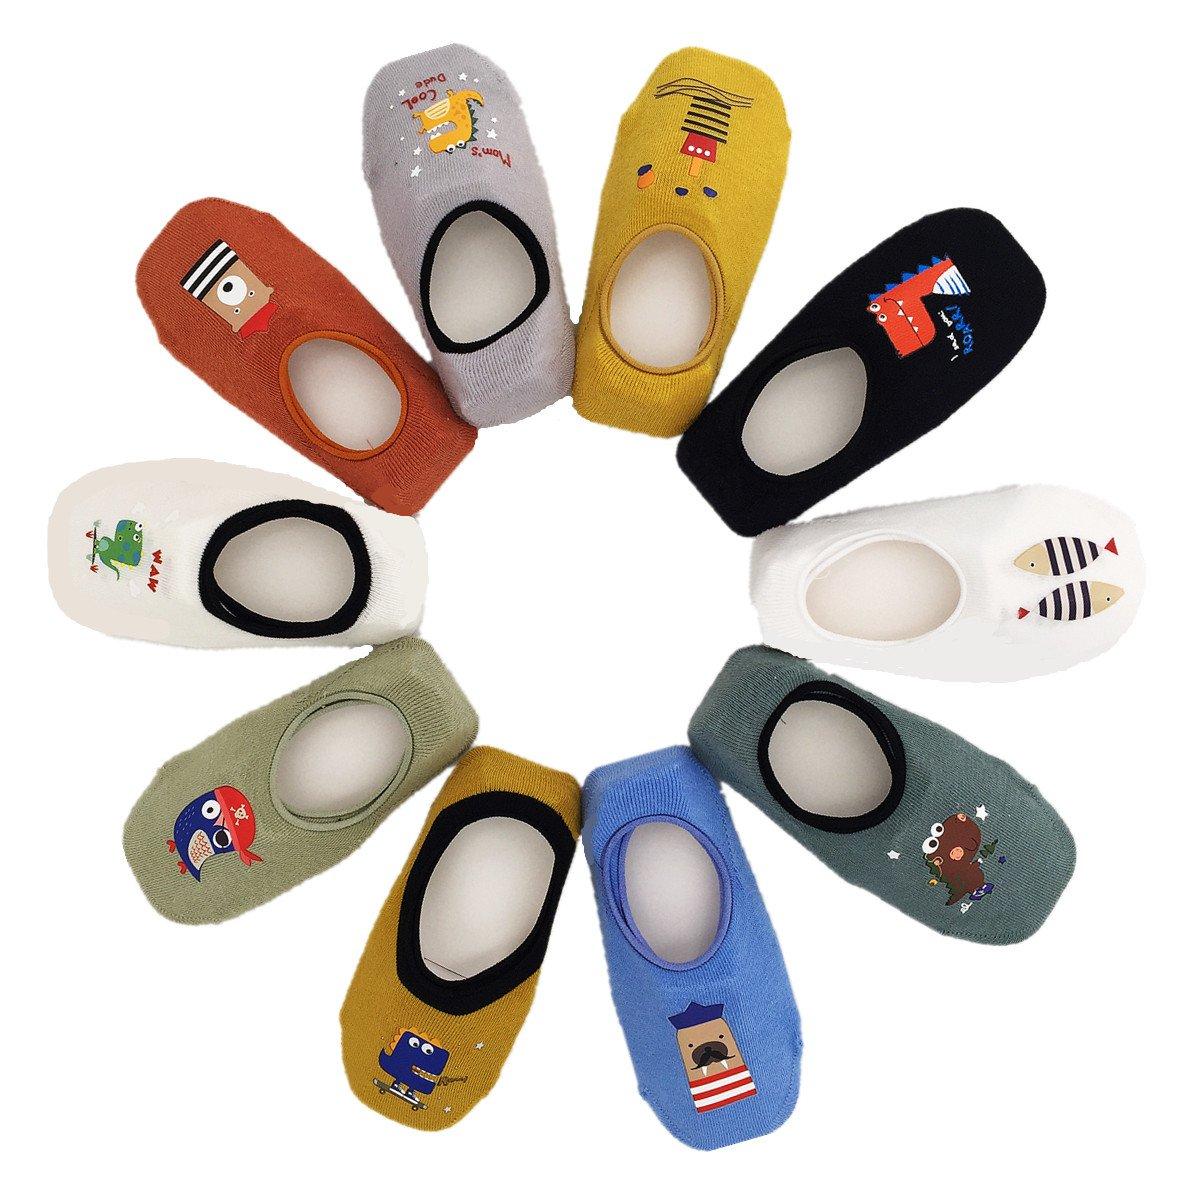 Toddler Non Skid No Show Socks - Low Cut Anti Slip Grip Slippers for Baby Kids Boys Girls 10 Pairs (1-2T, Dinosaur)